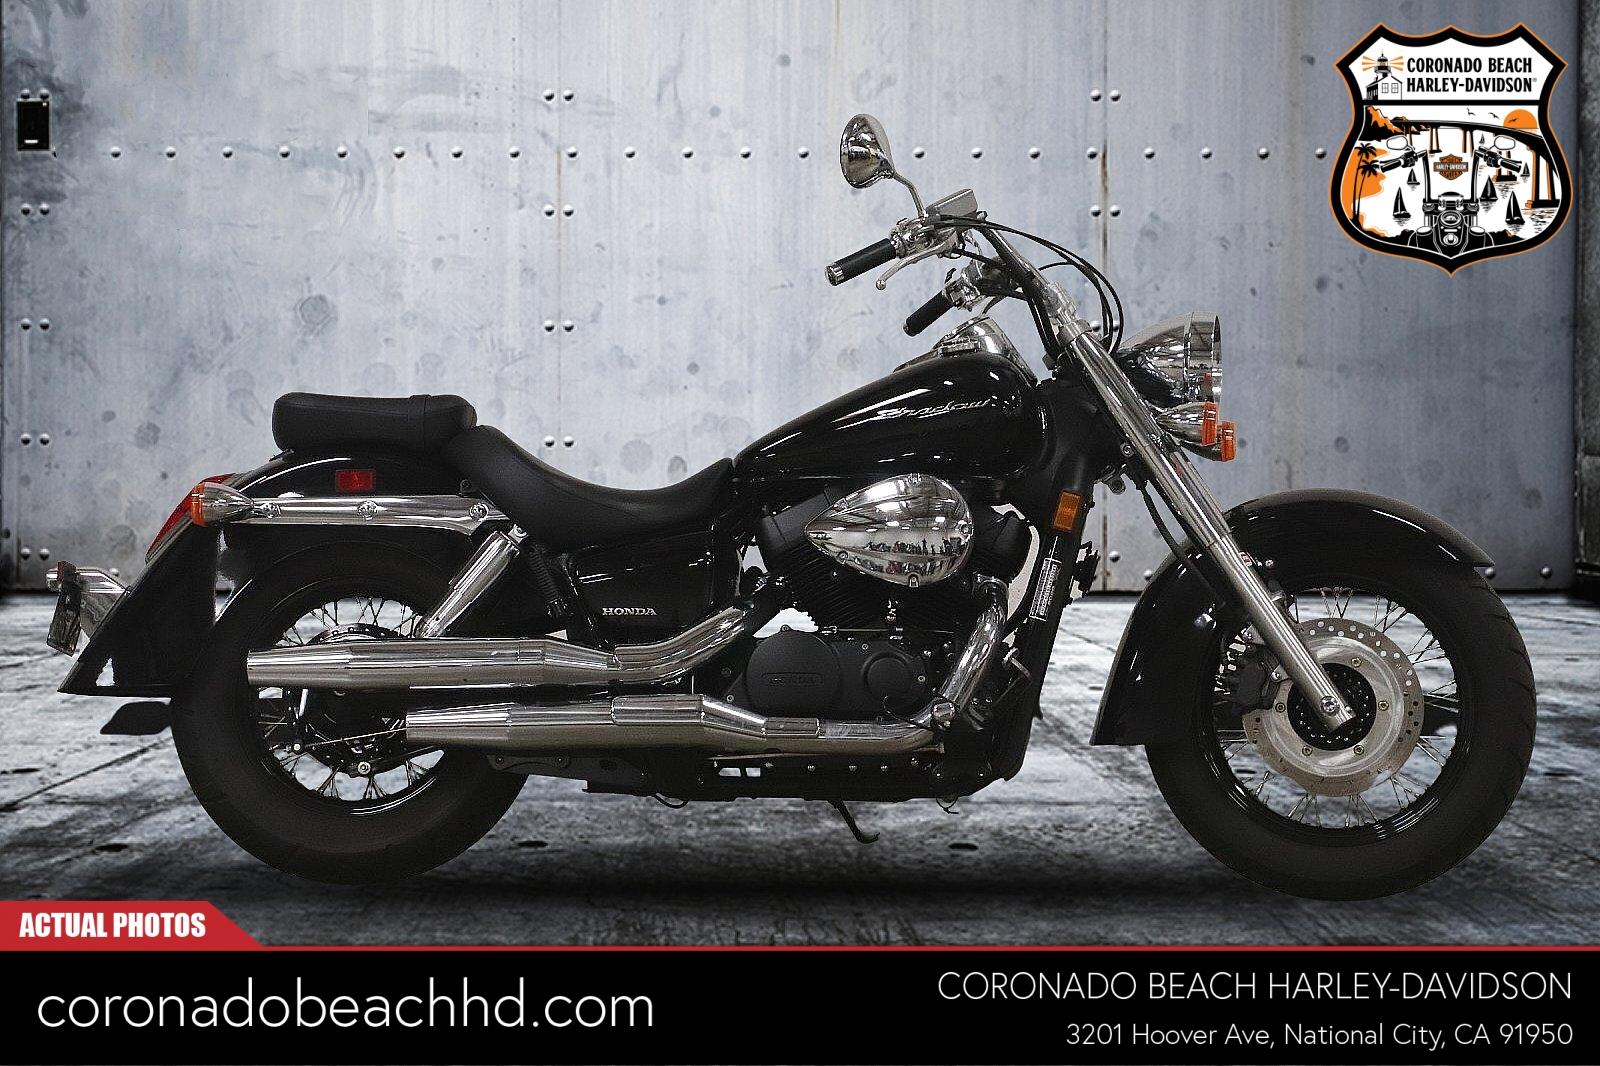 2020 Honda Shadow 800 [7]